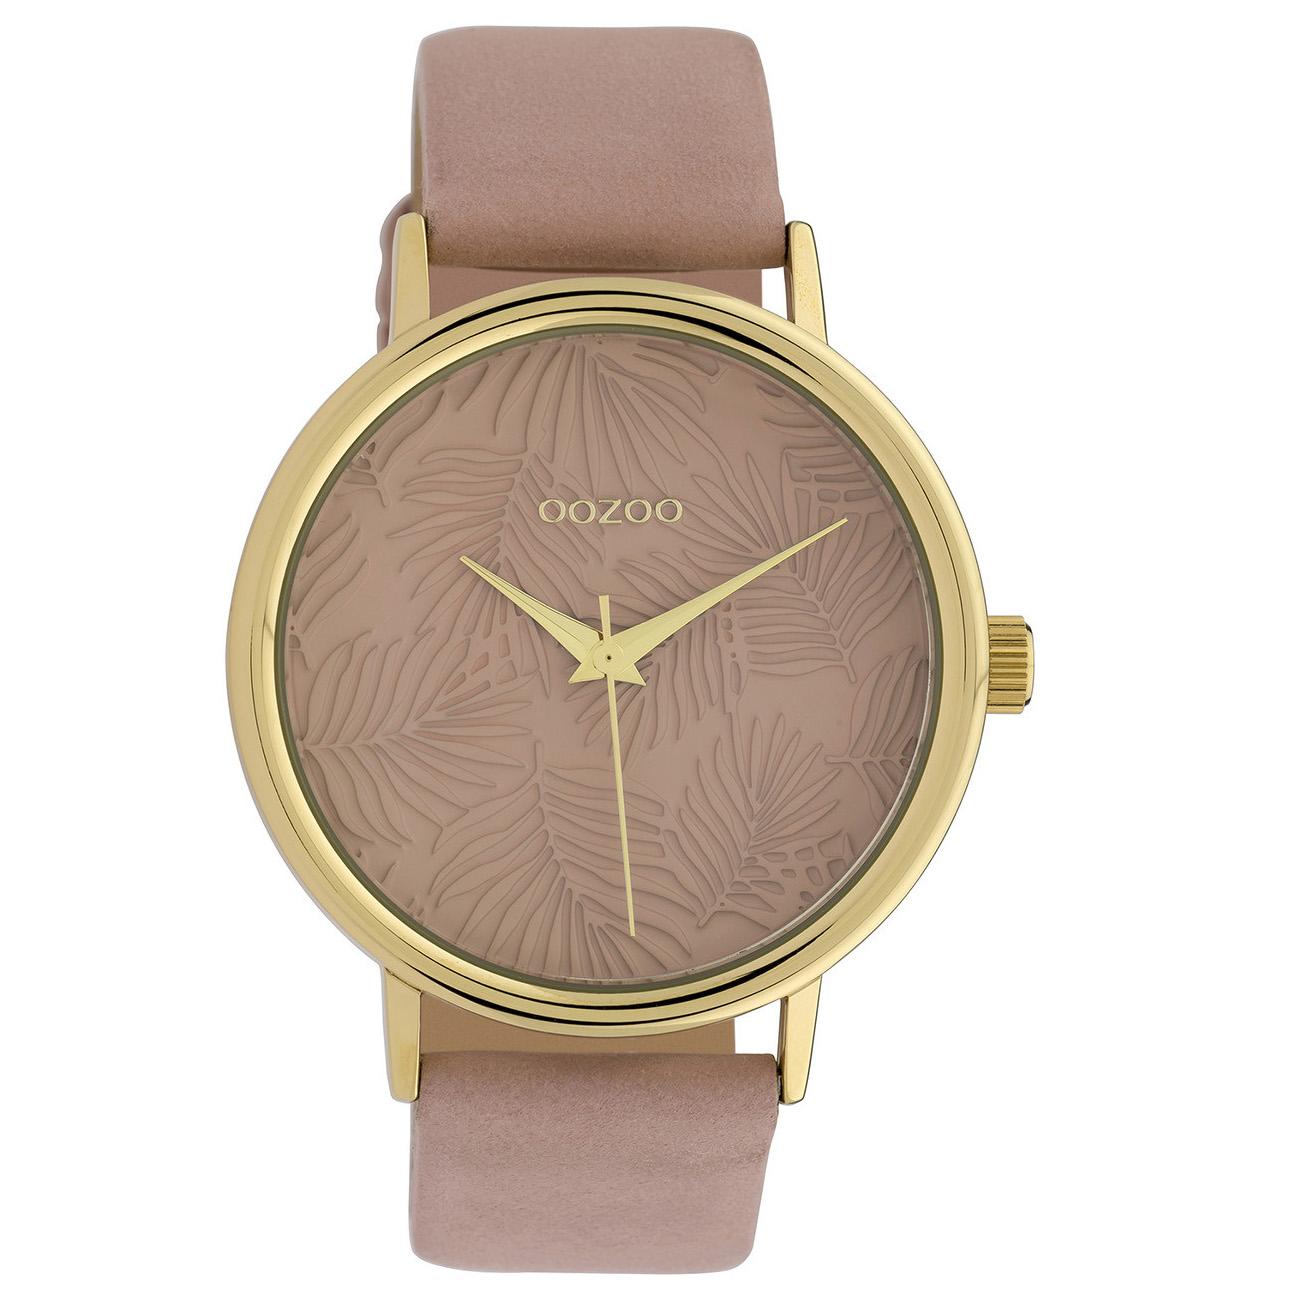 OOZOO C10081 Horloge Timepieces Collection staal-leder goudkleurig-softpink 42 mm